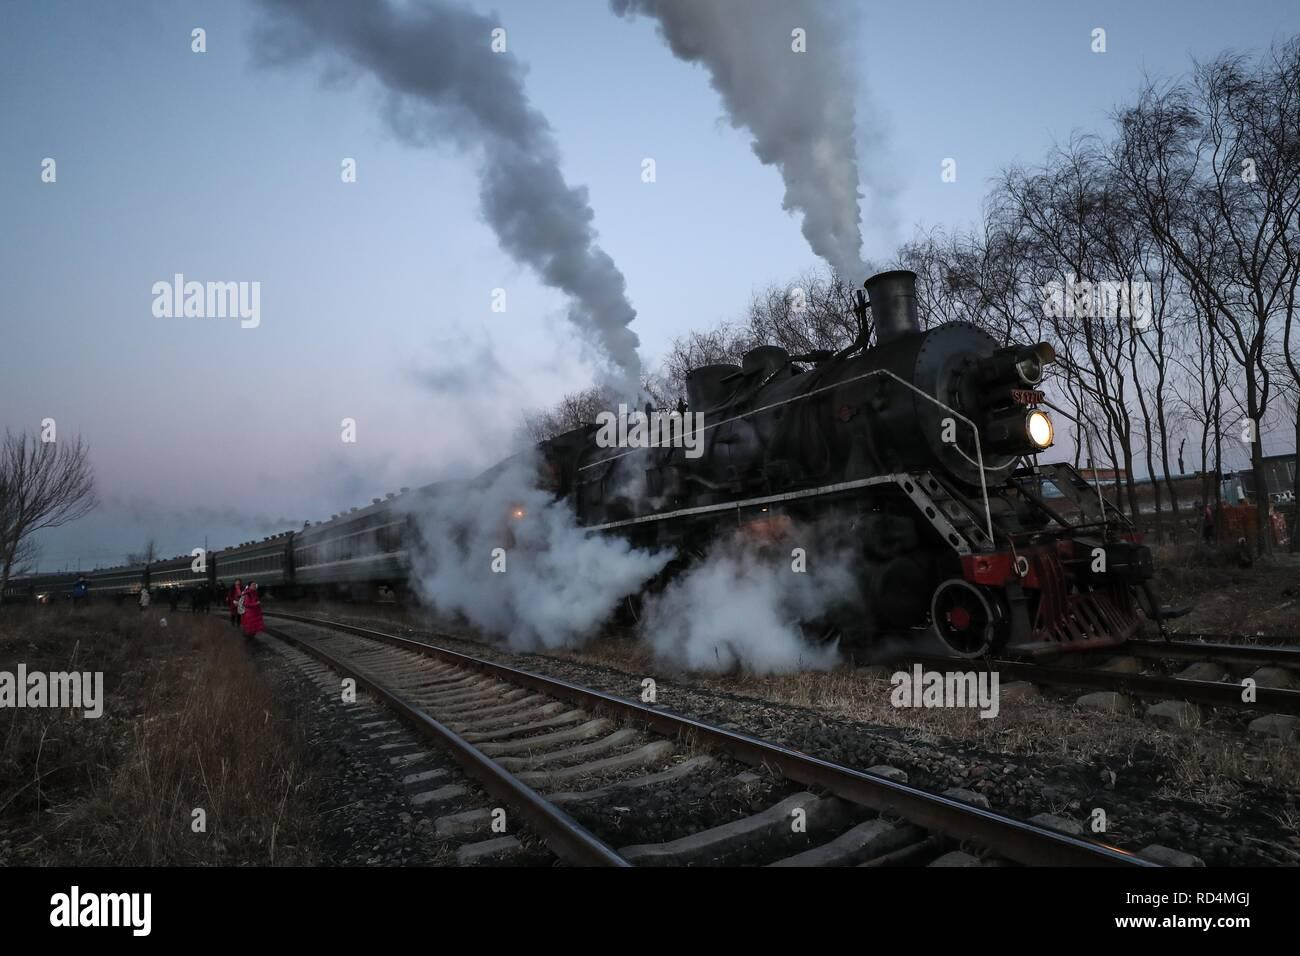 Diaobingshan, Ltd from Diaobingshan Station  17th Jan, 2019